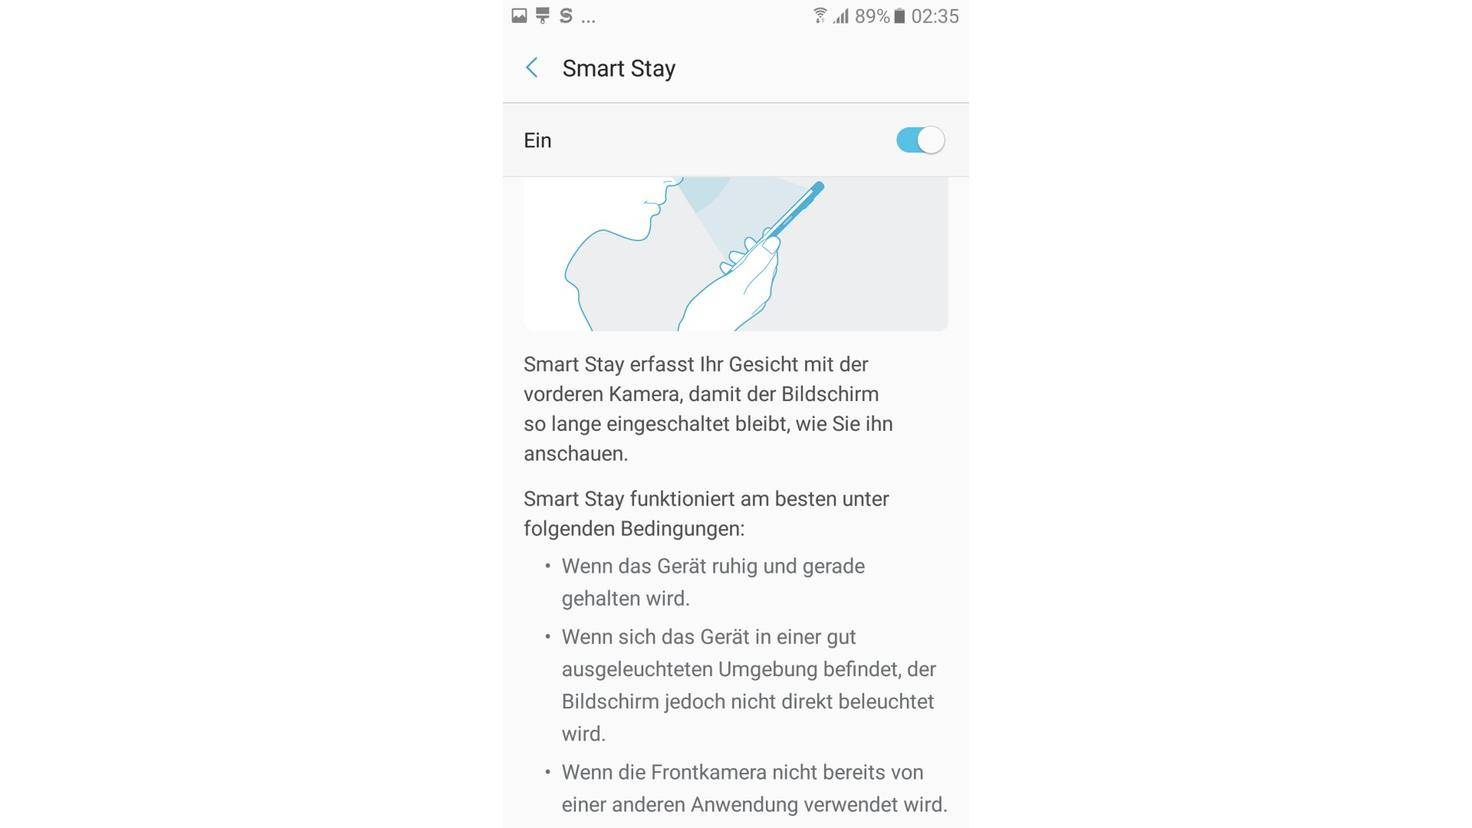 Smart Stay Galaxy A5 2017